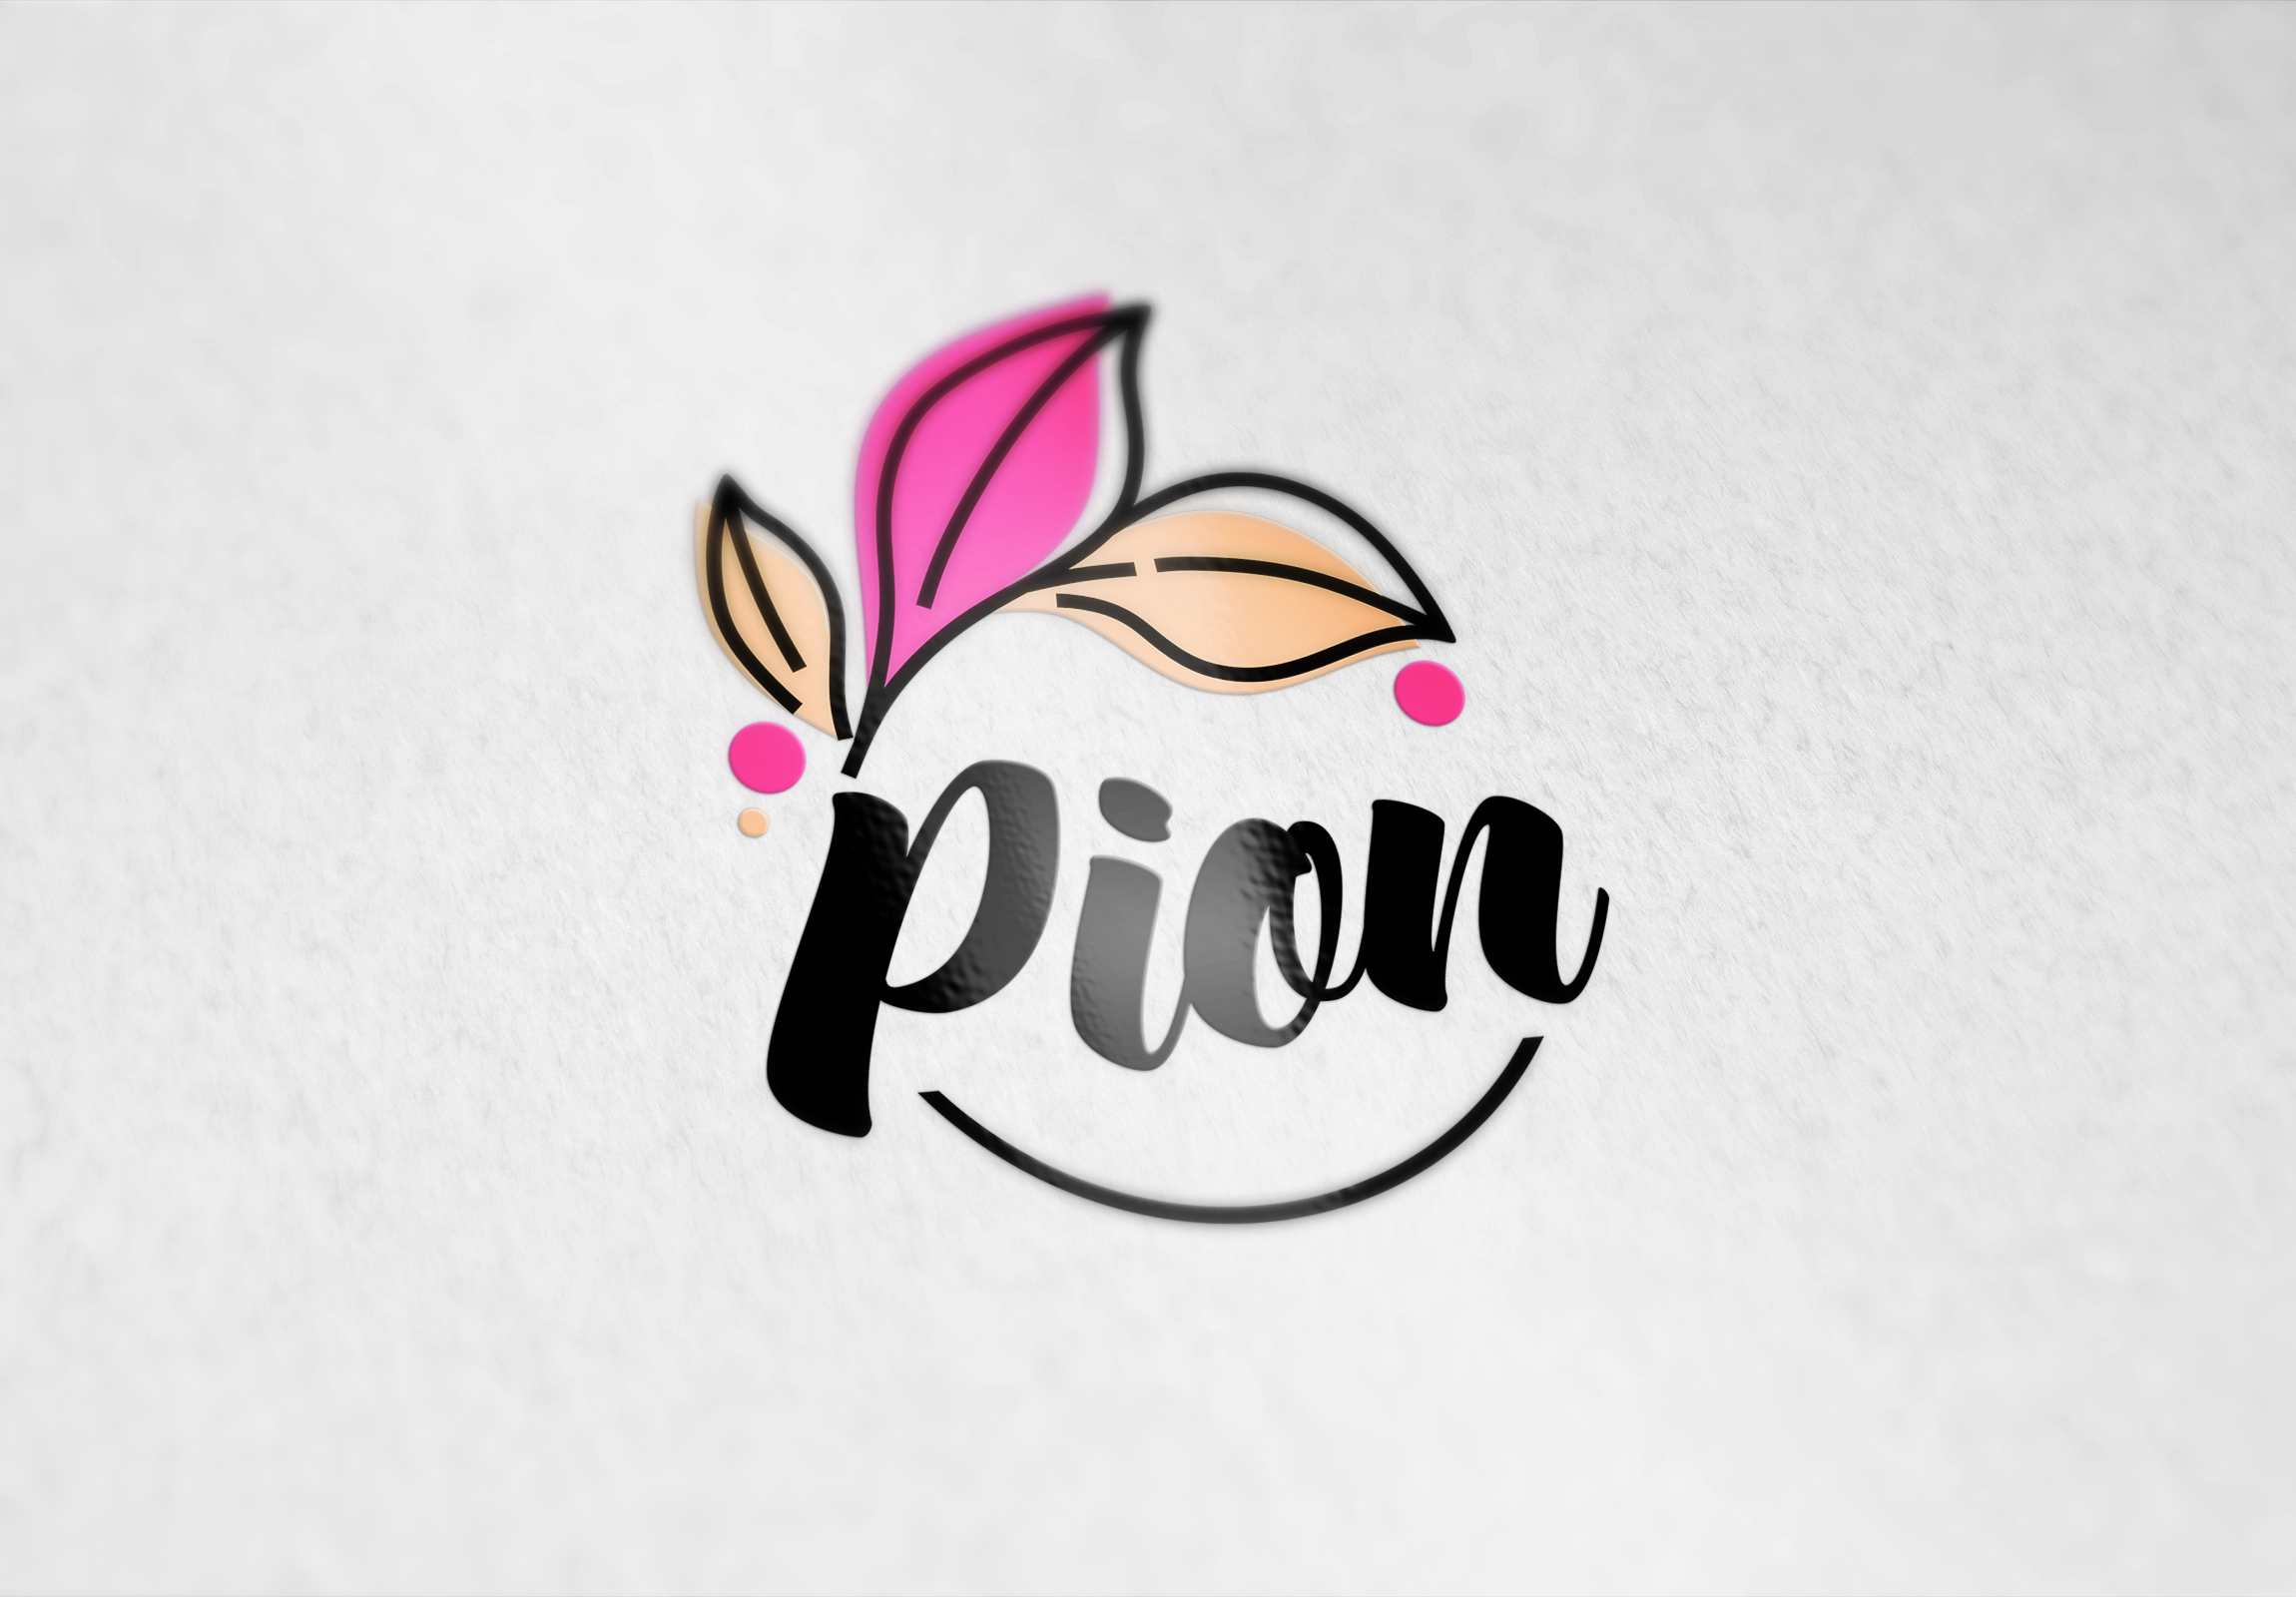 Pion logo design